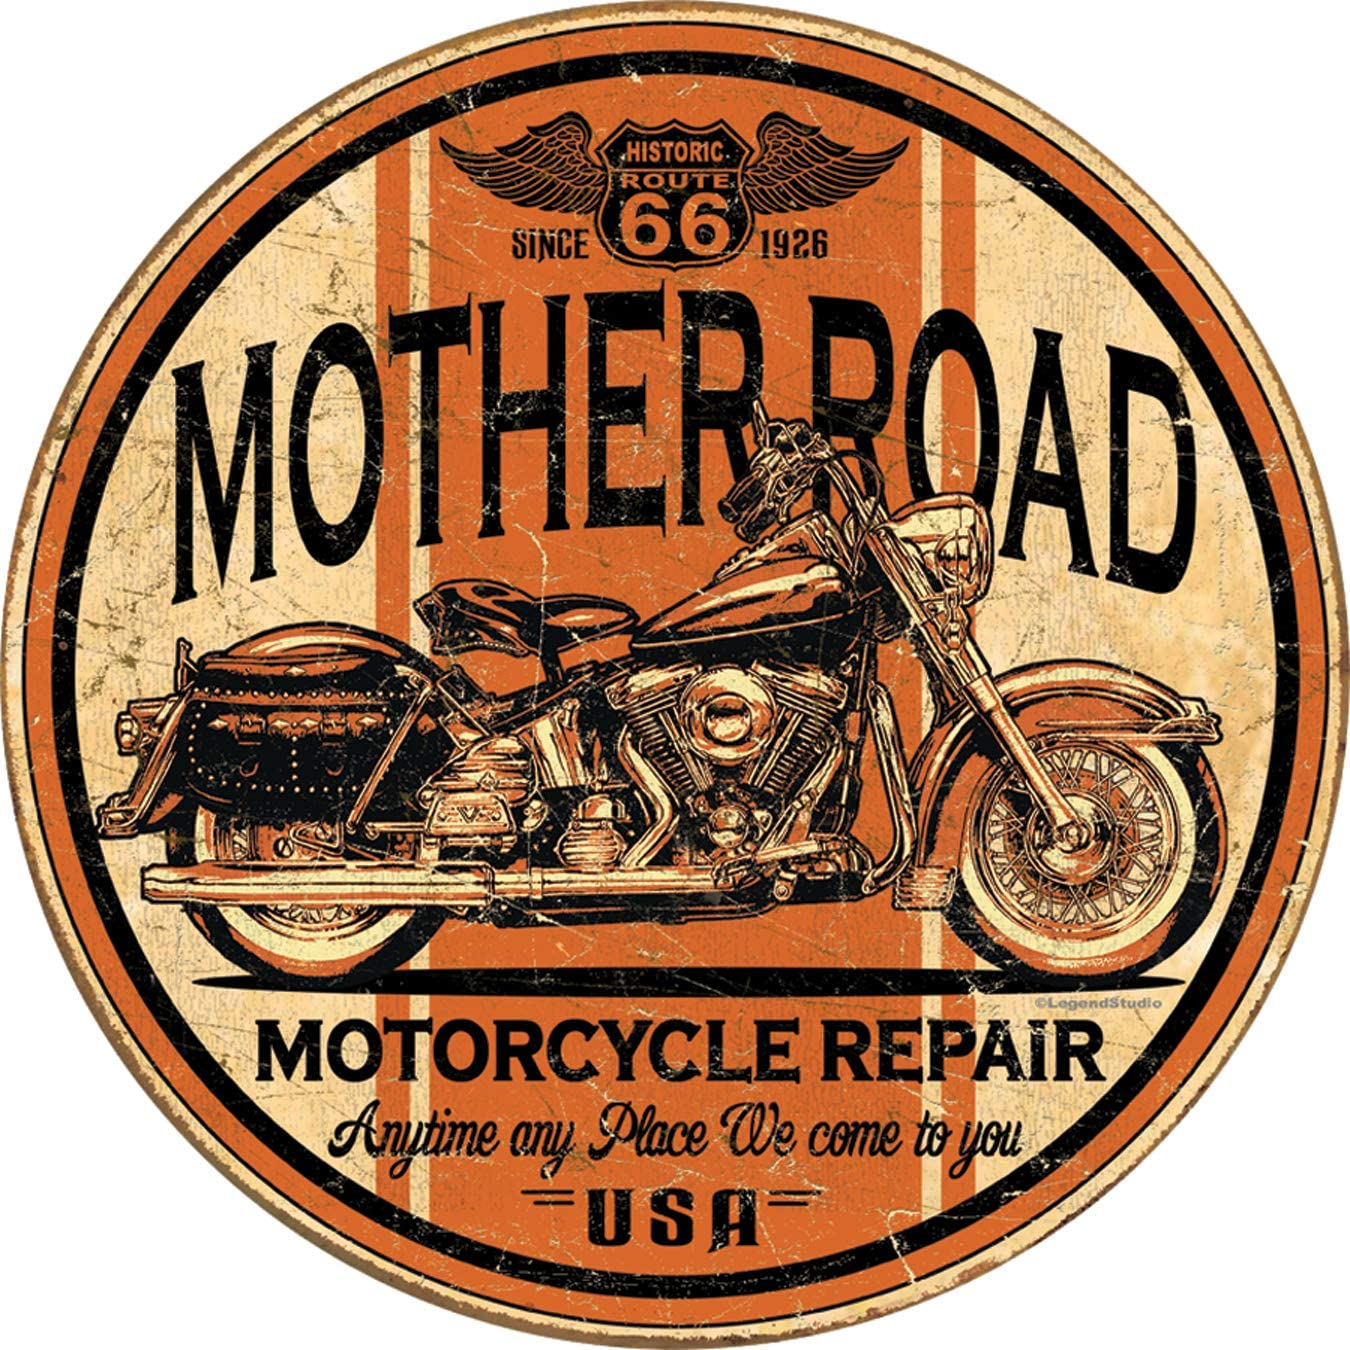 Harley Davidson Motorbike Bike Wooden Vintage Retro Style Wall Bottle Opener